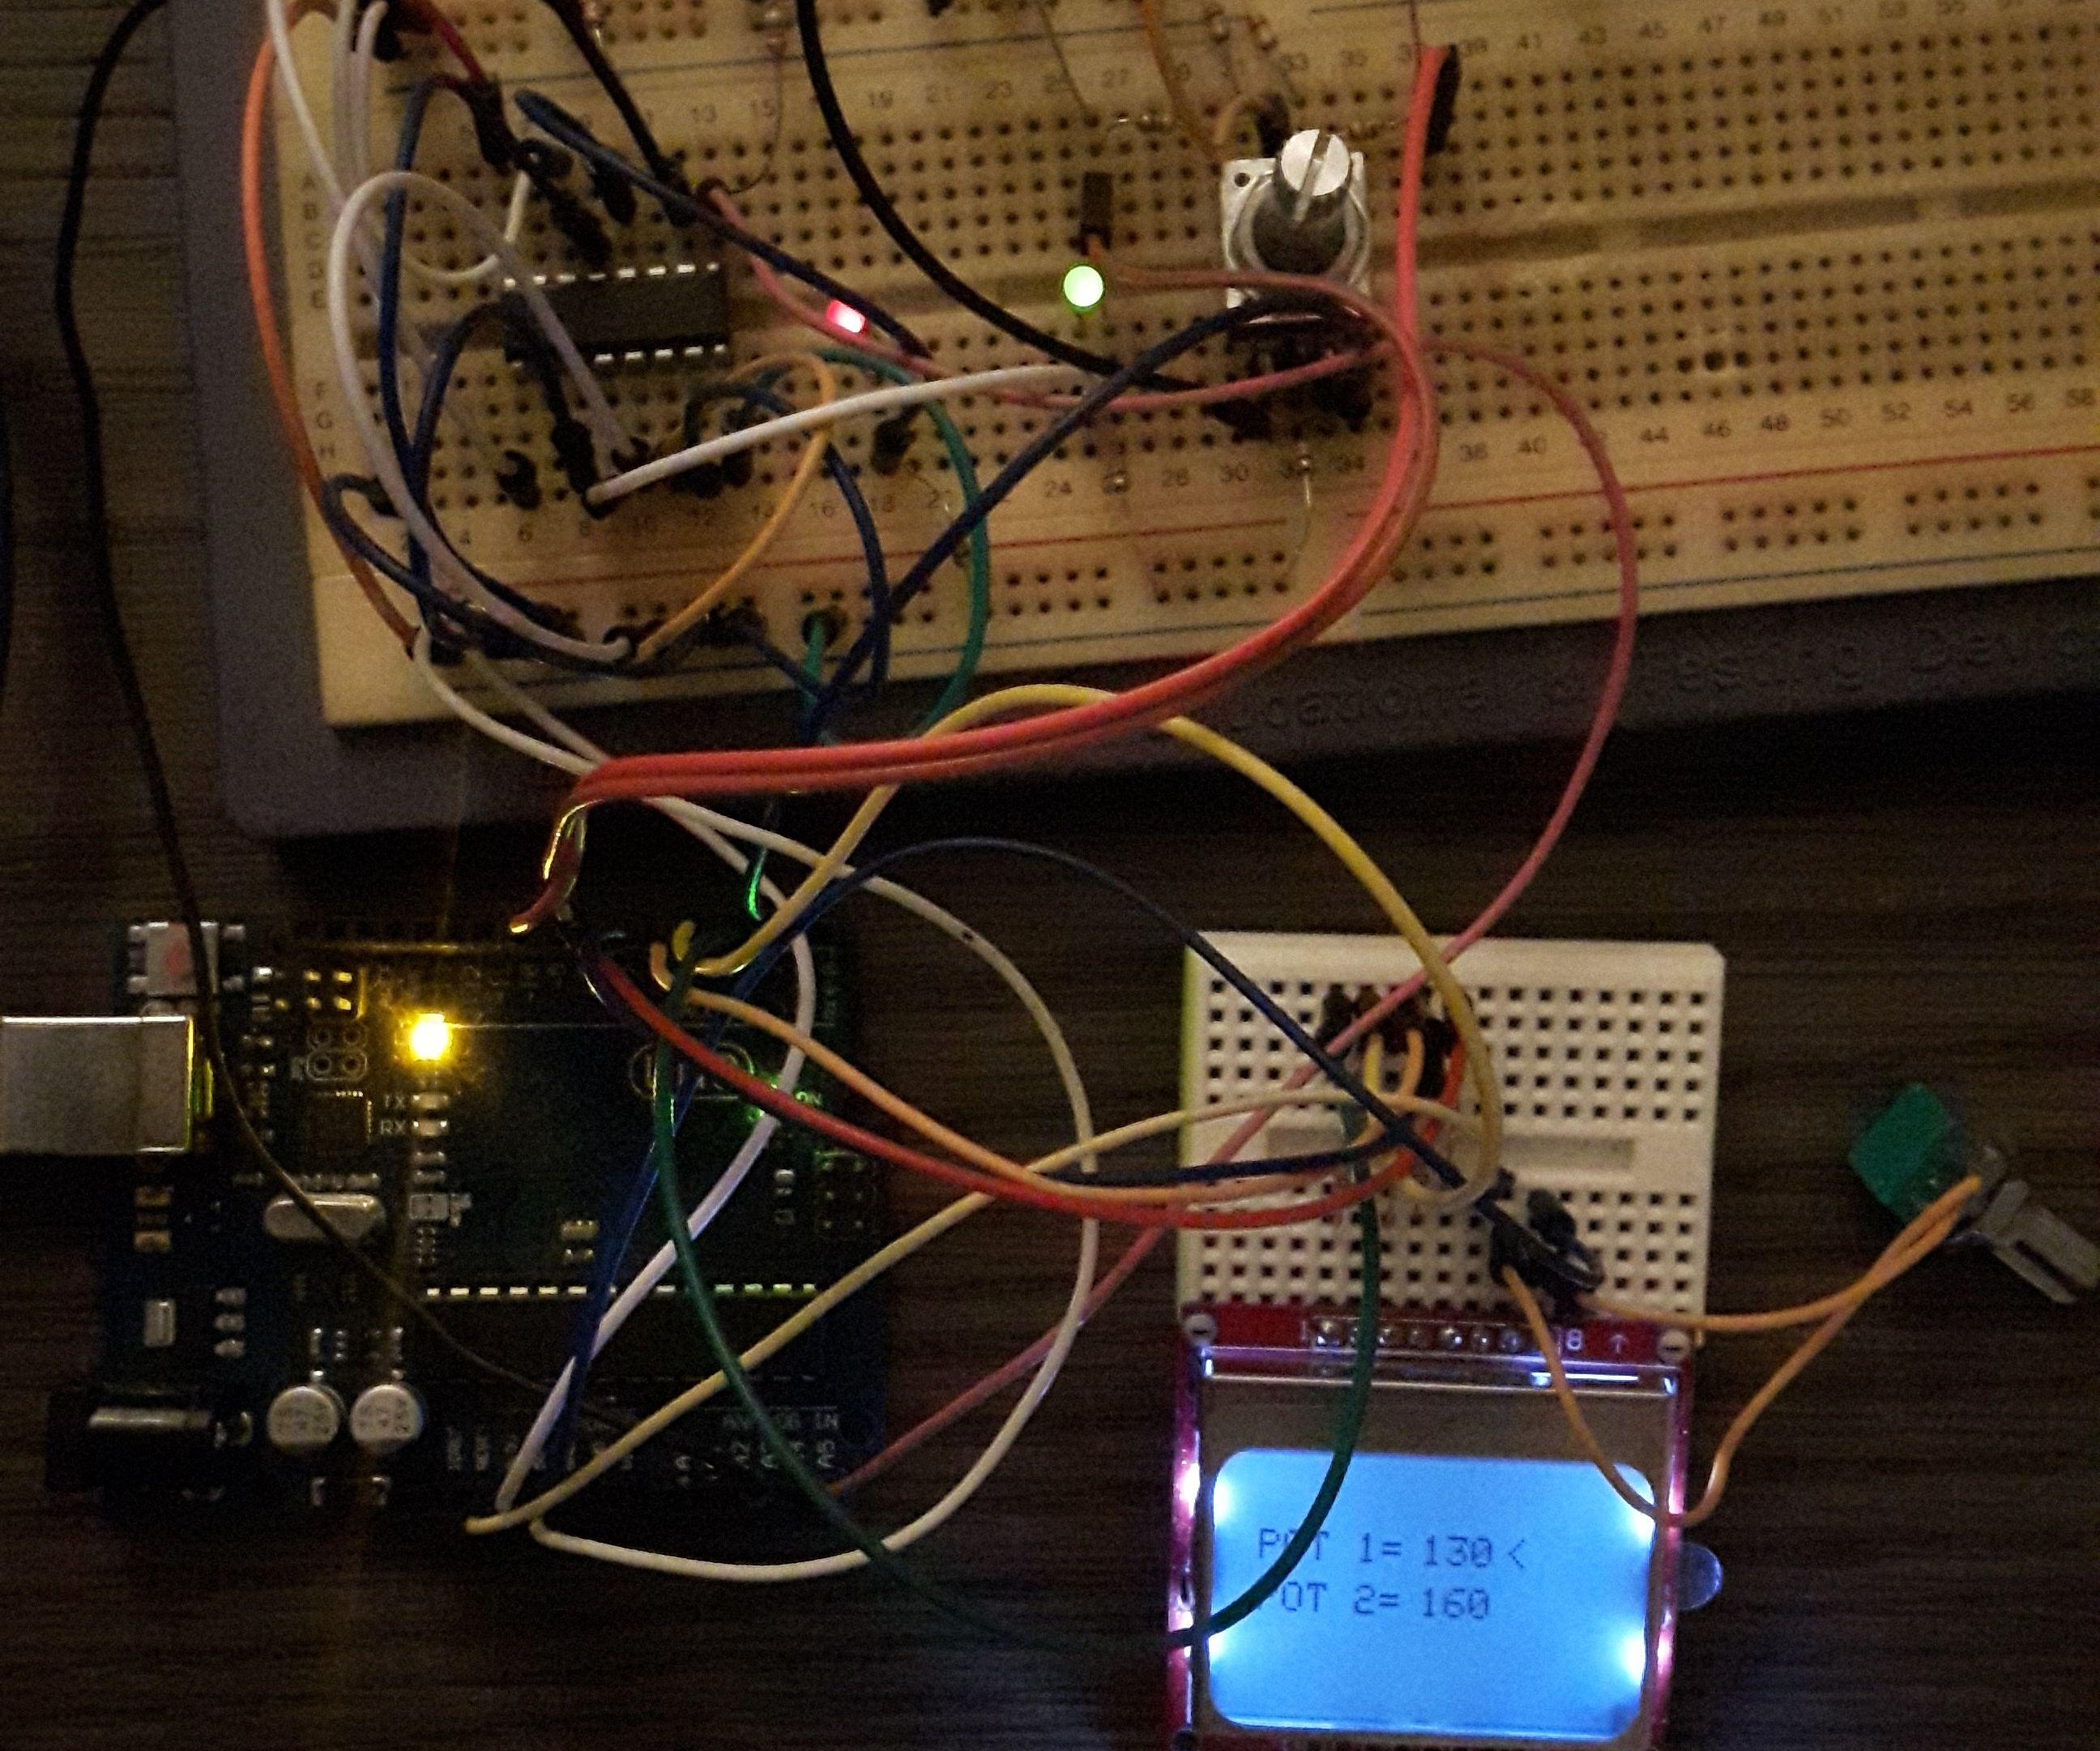 DS1803 Dual Digital Potentiometer With Arduino